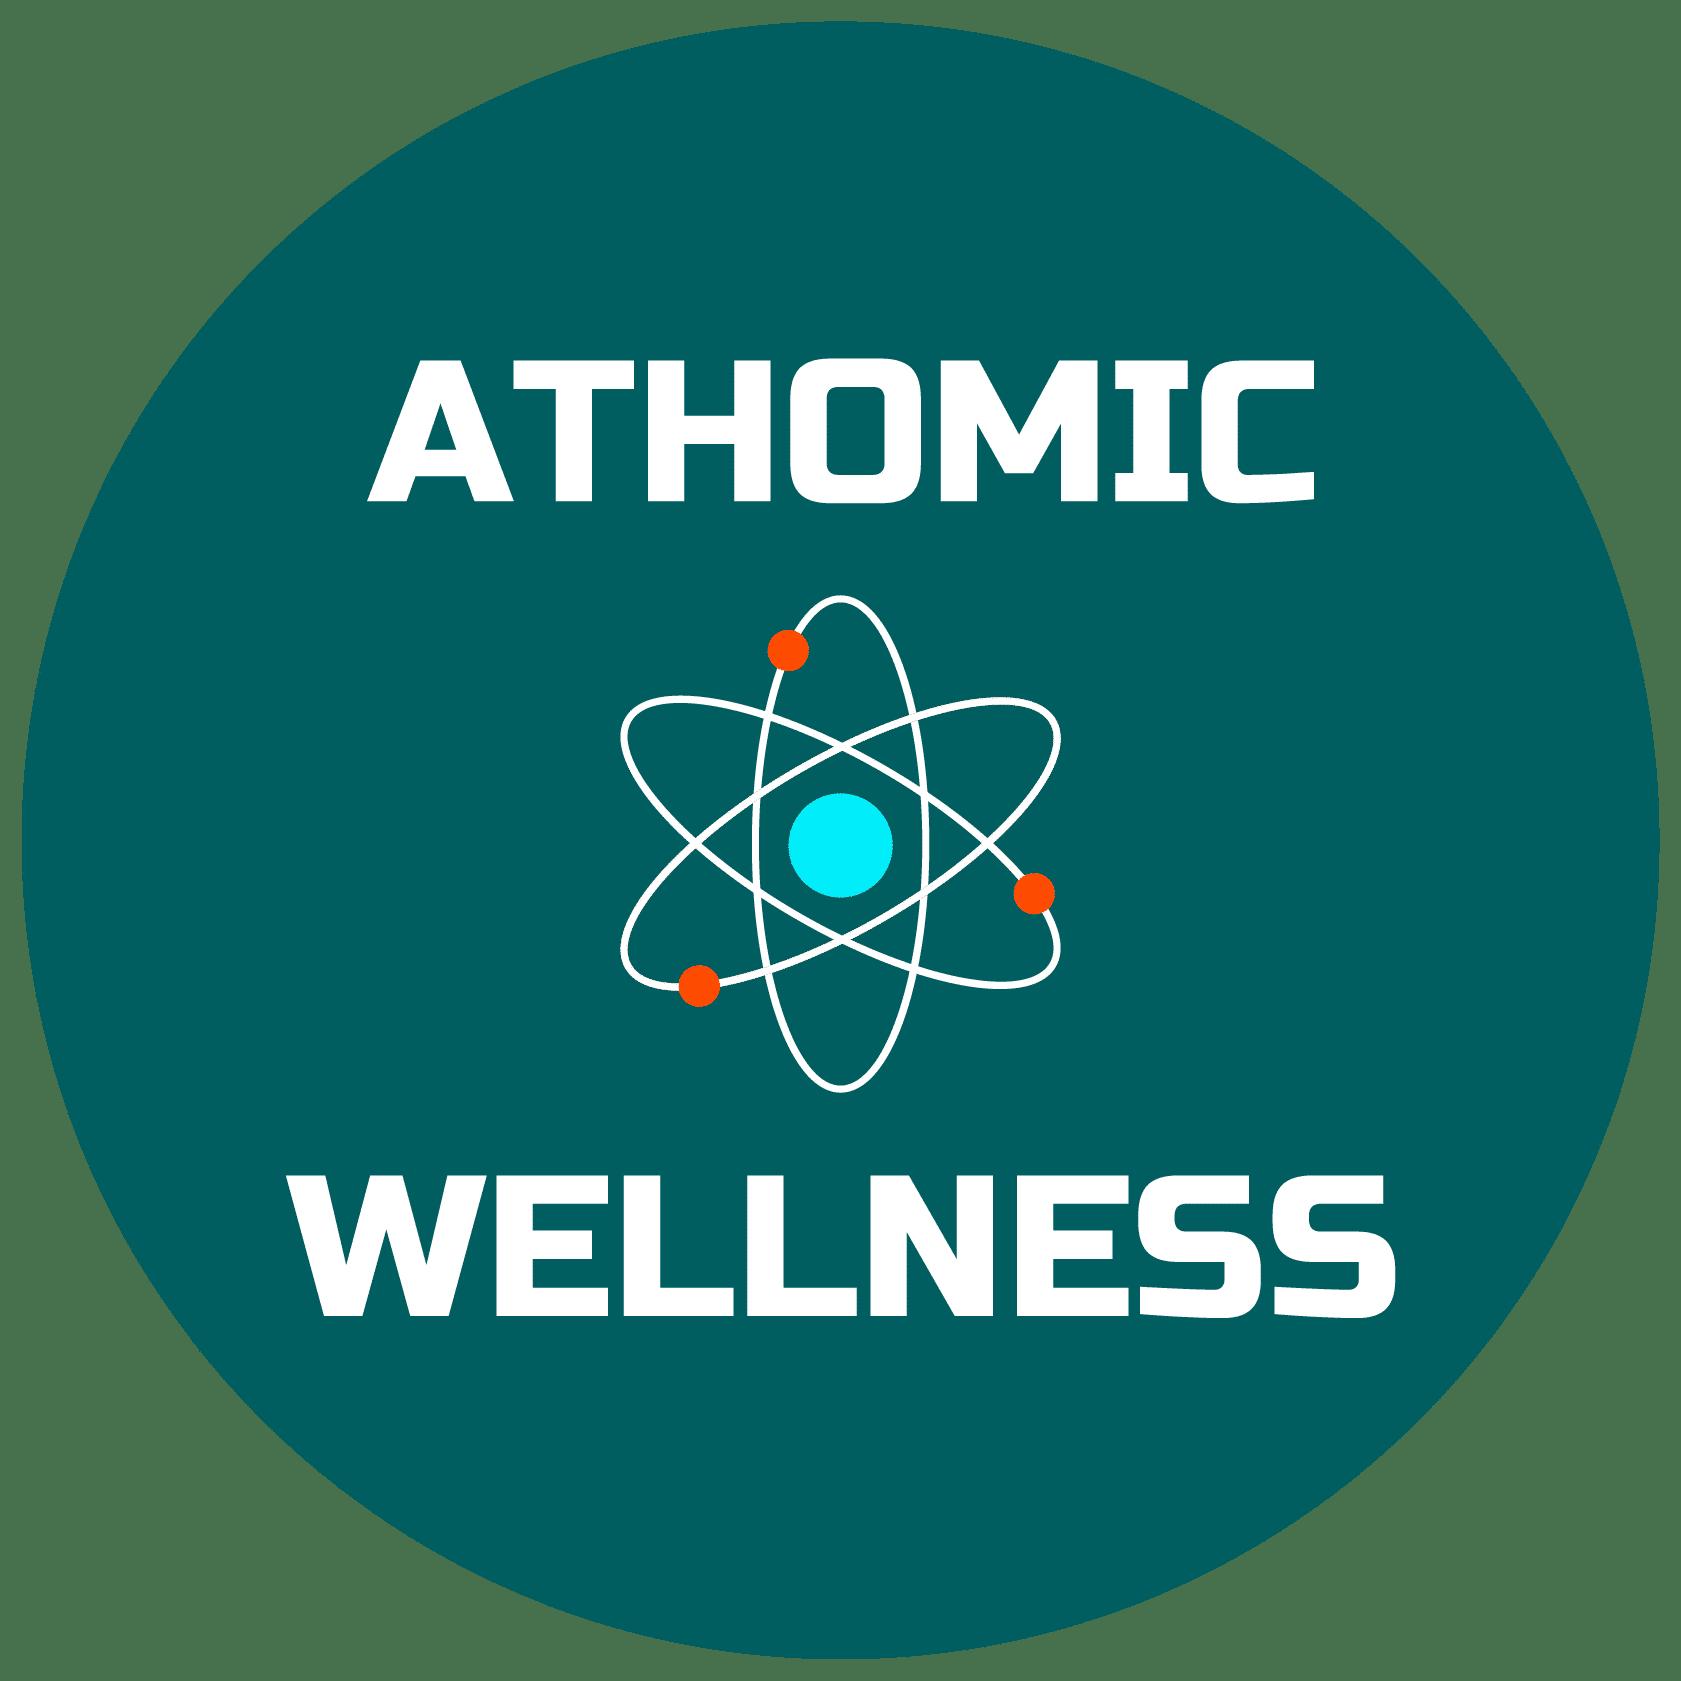 Athomic Wellness